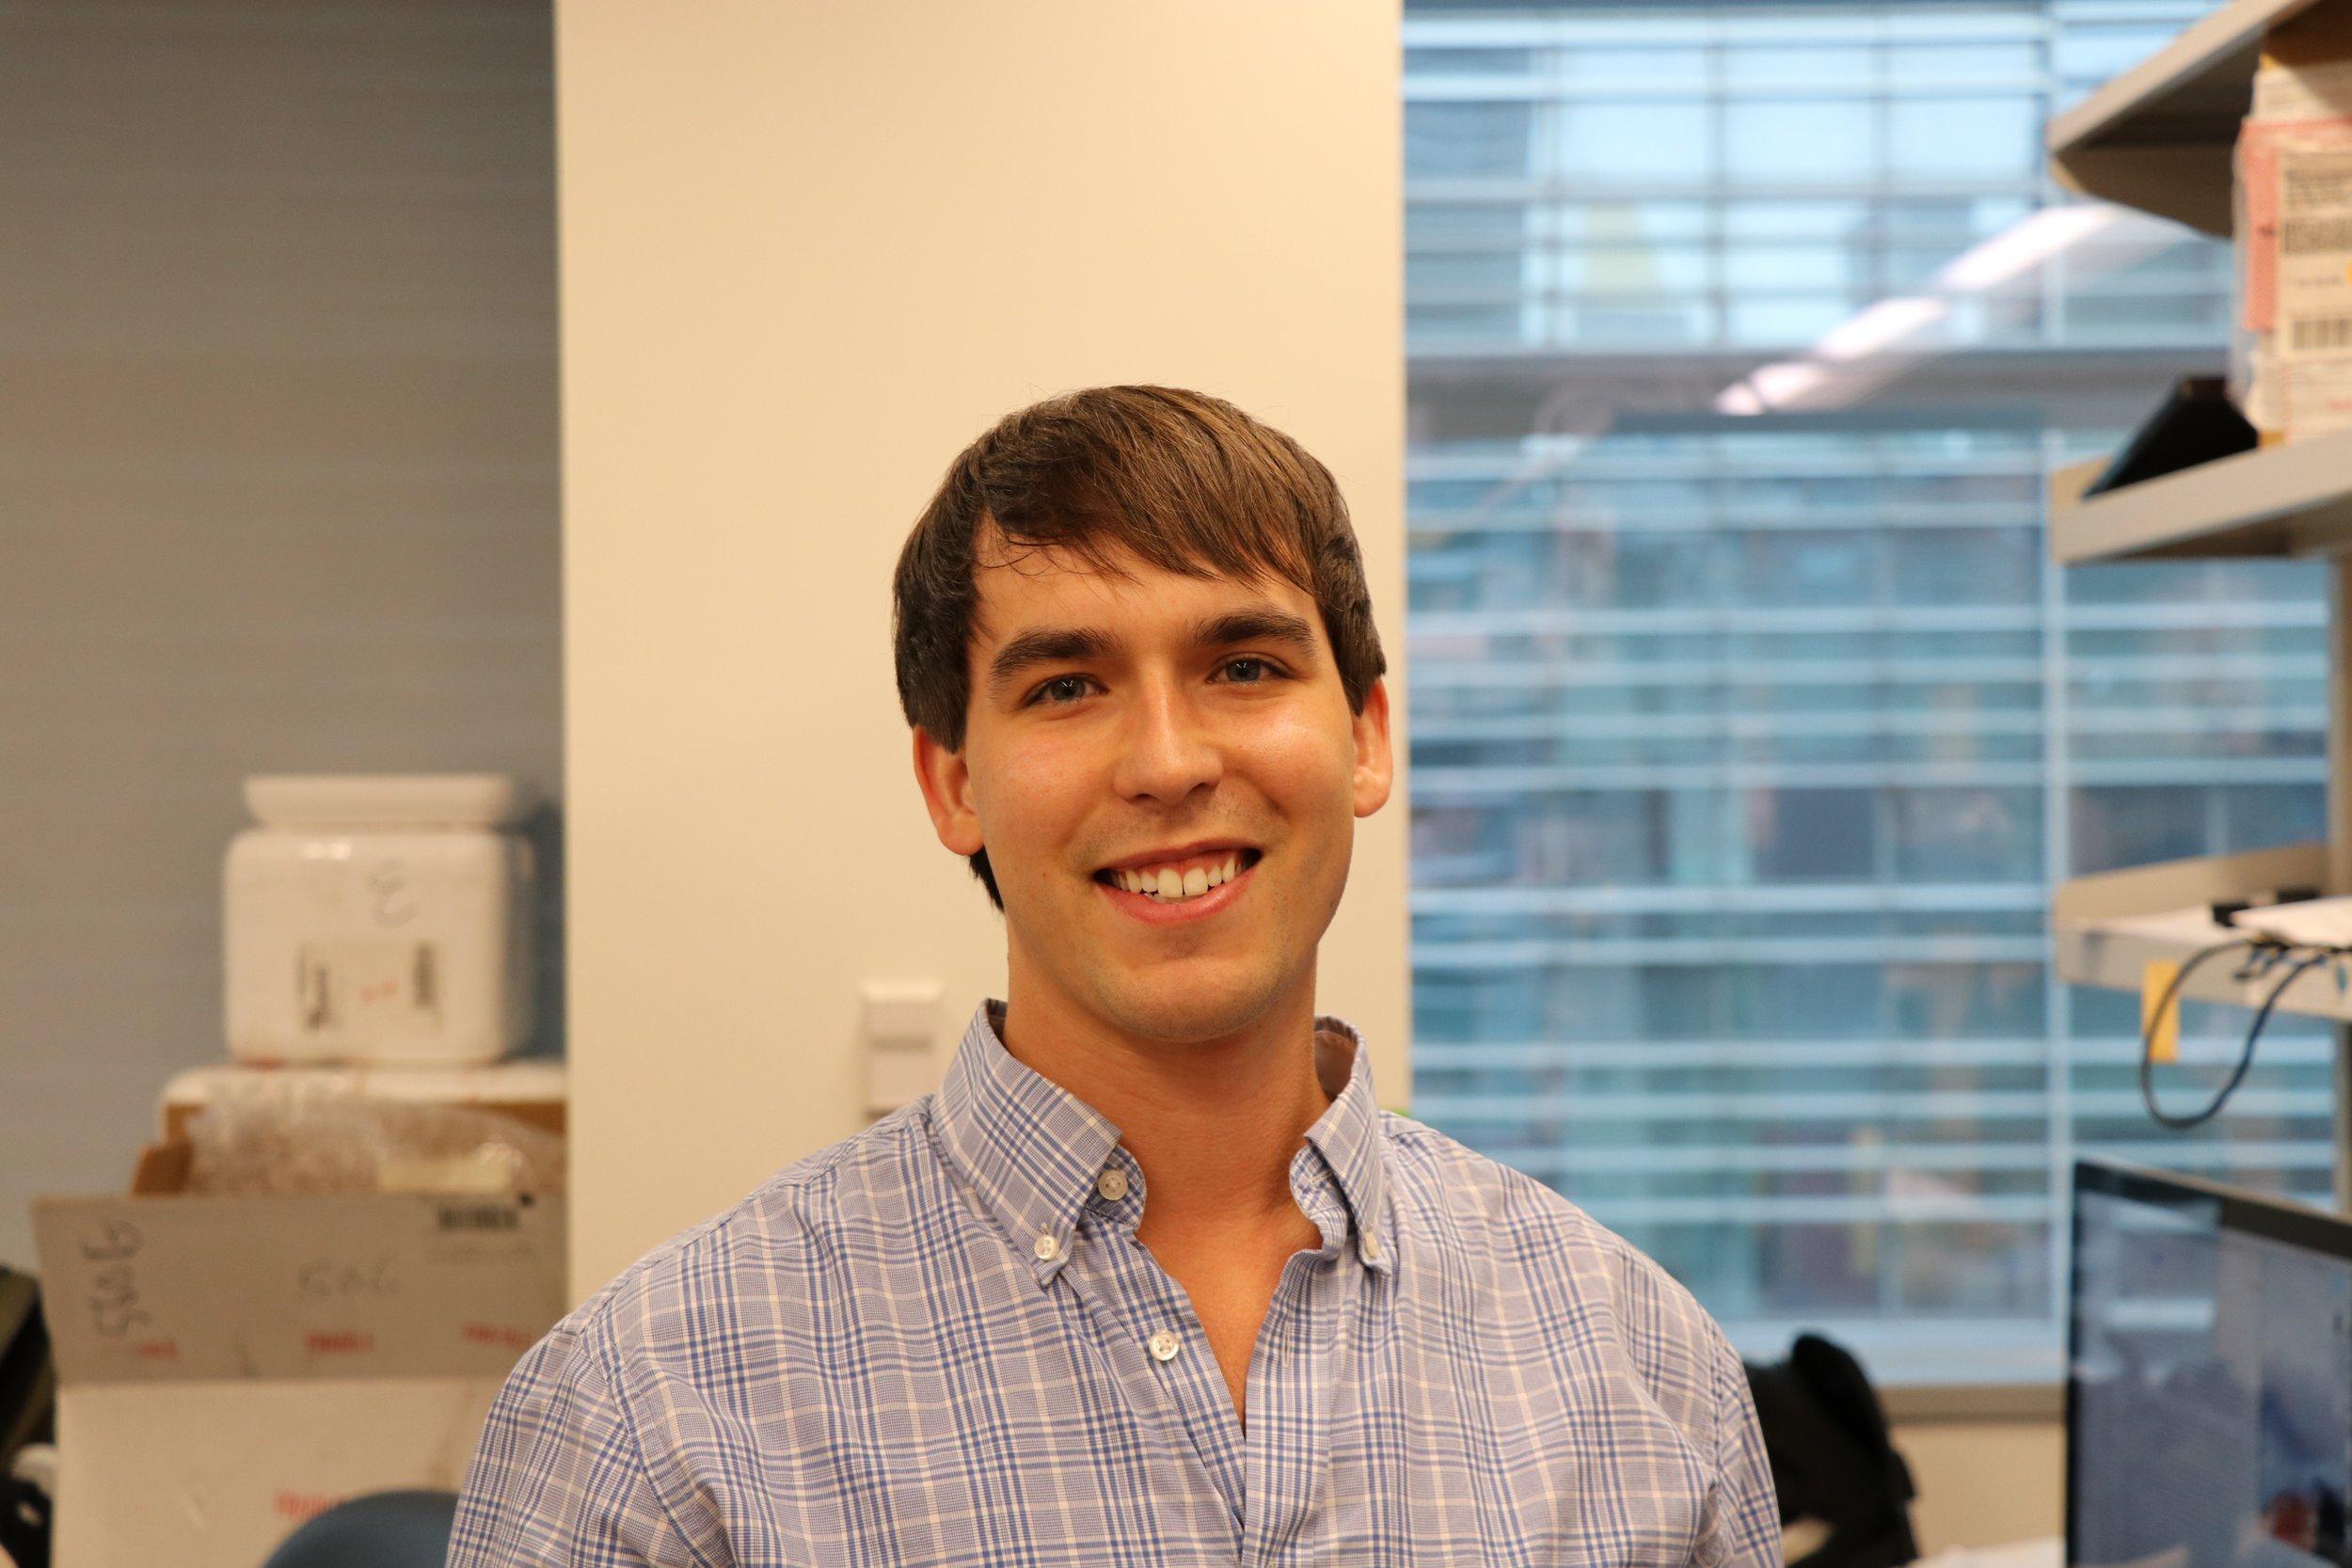 Greg Brittingham, Graduate Student